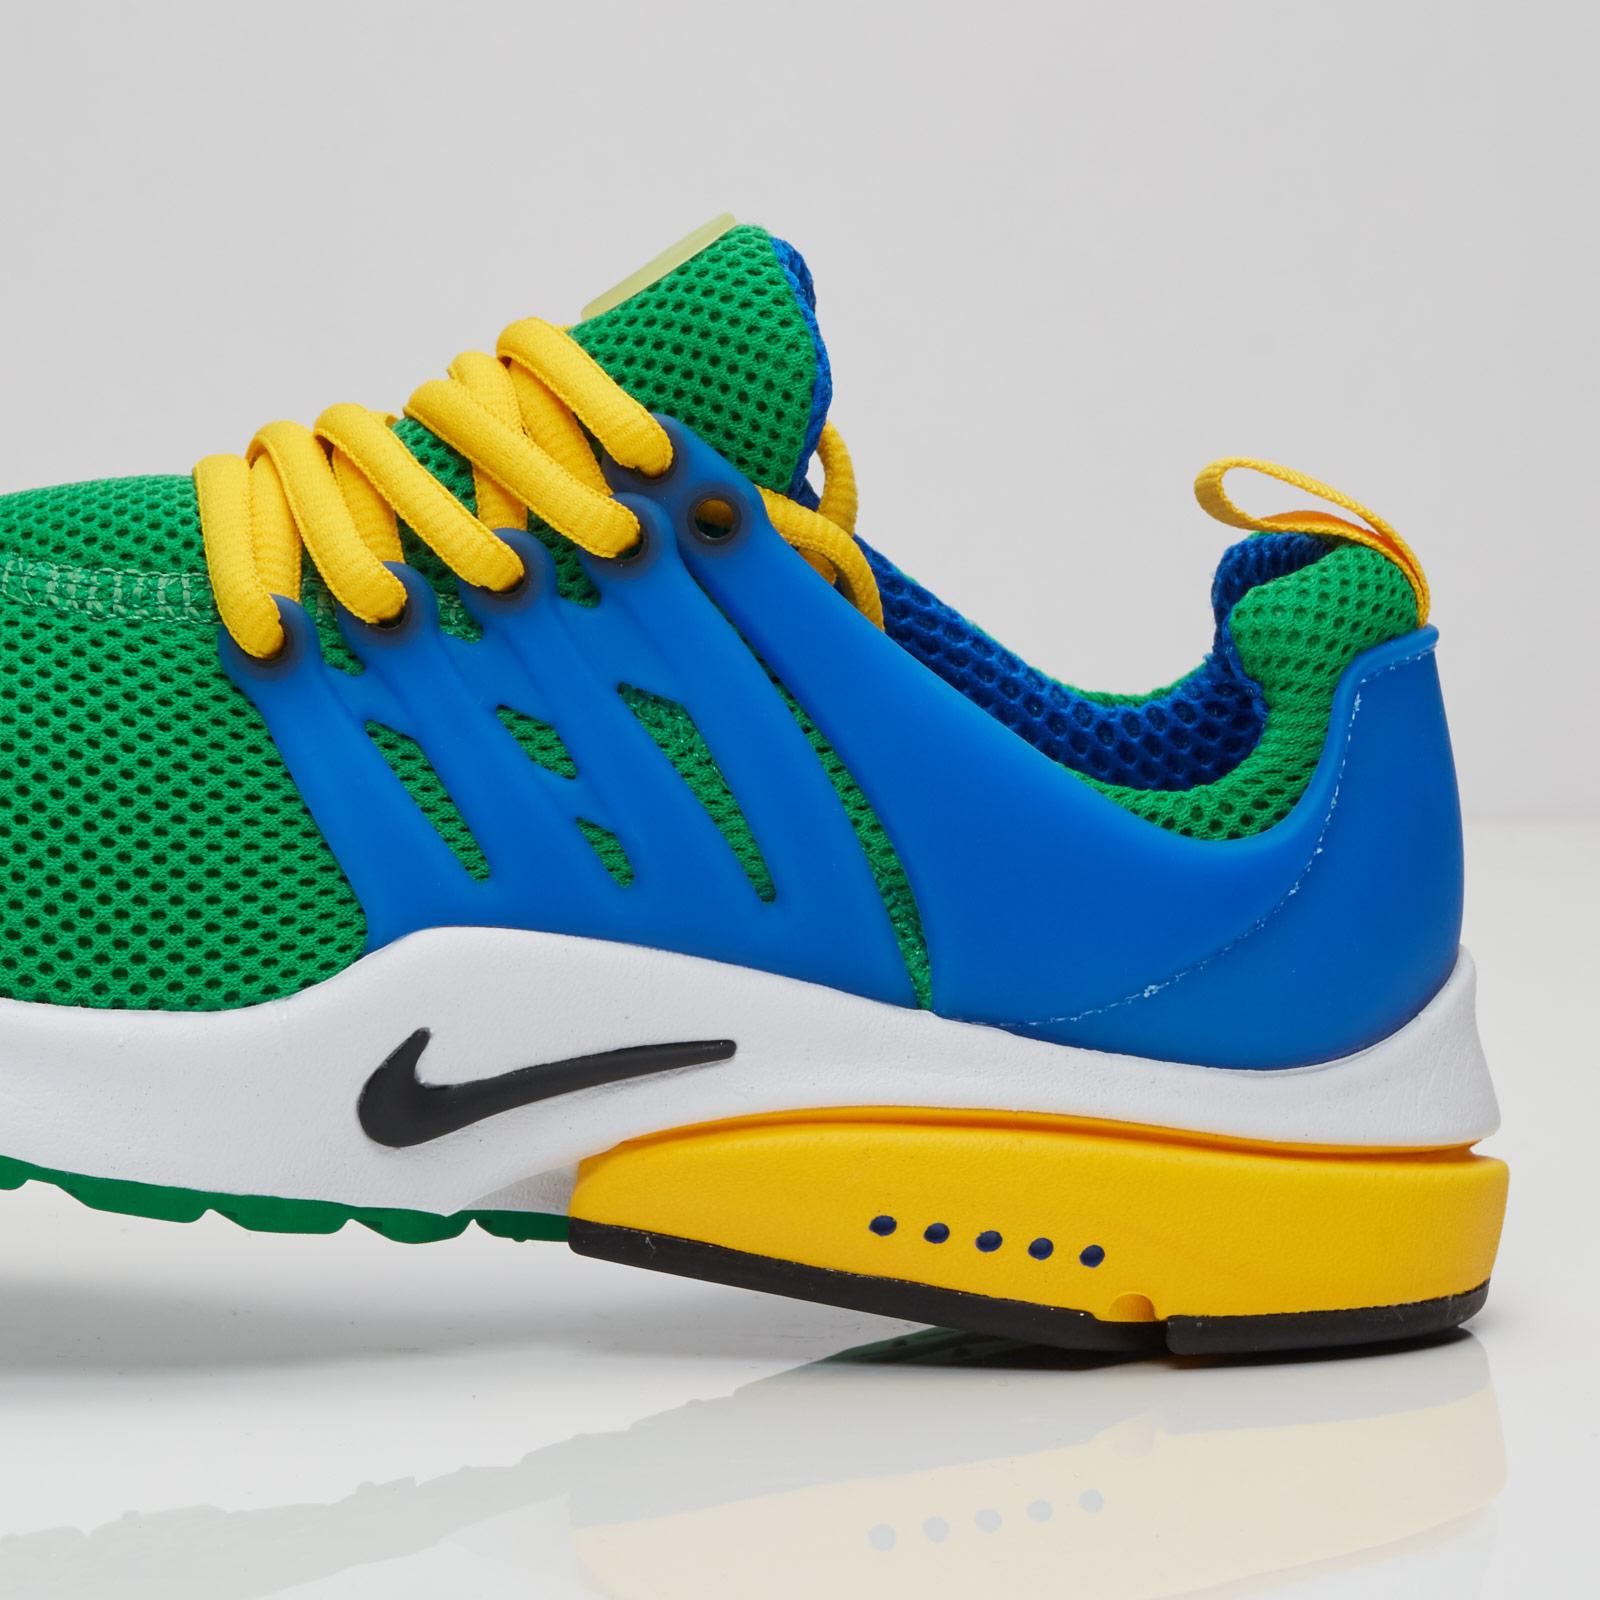 Nike-Air-Presto-14.jpg